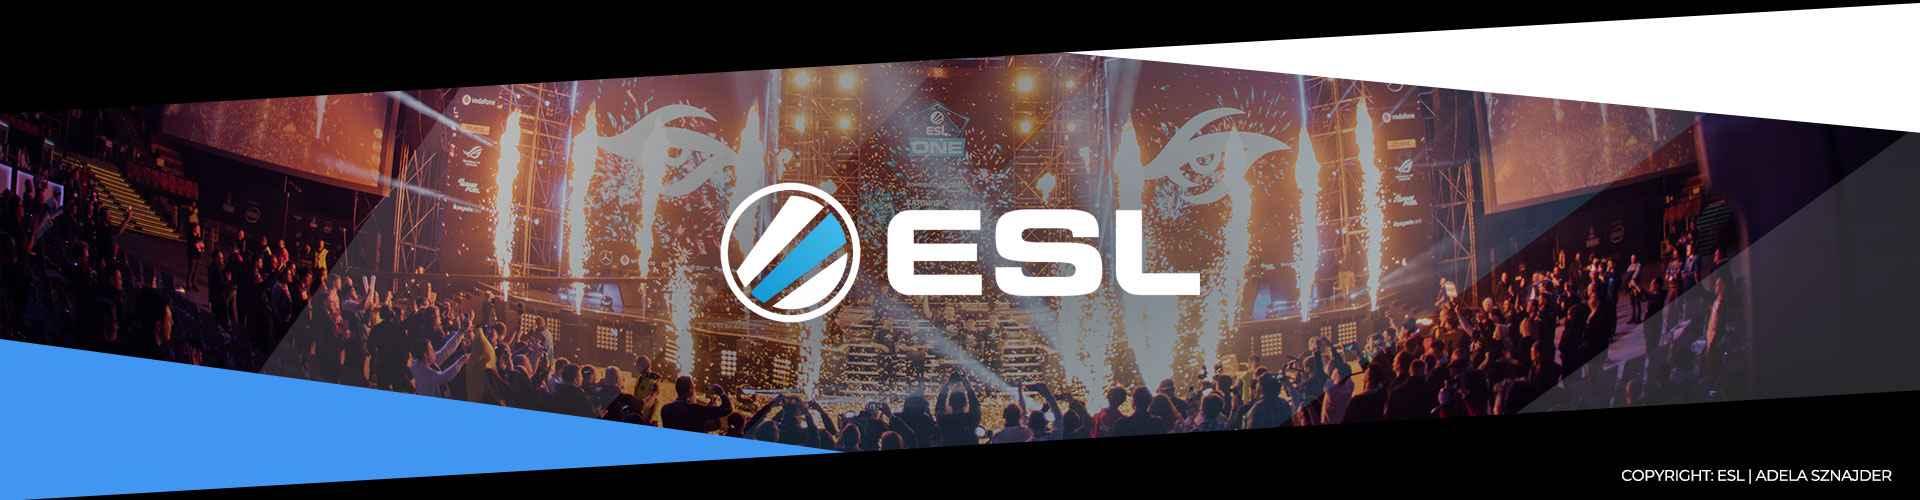 Dota 2 - ESL One Katowice 2019